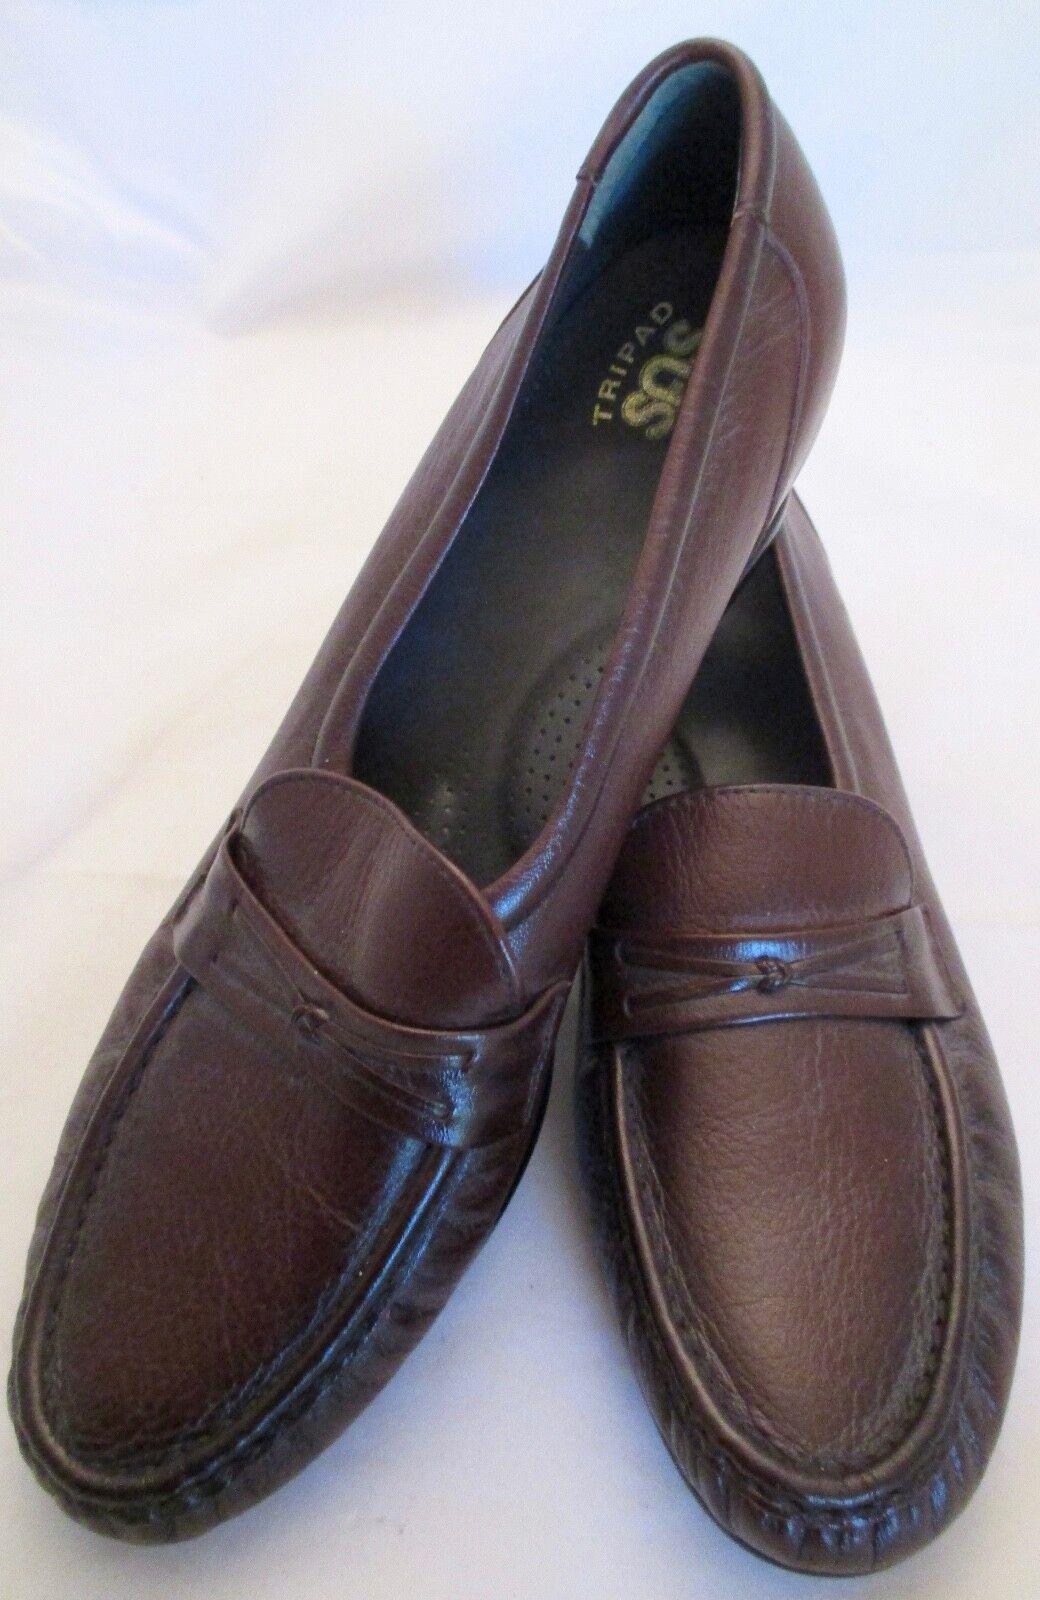 SAS Braun Slip-On Leder Tripad Comfort SZ Loafer Pebbled Damenschuhe Schuhe SZ Comfort 11 1/2 S c8ece6